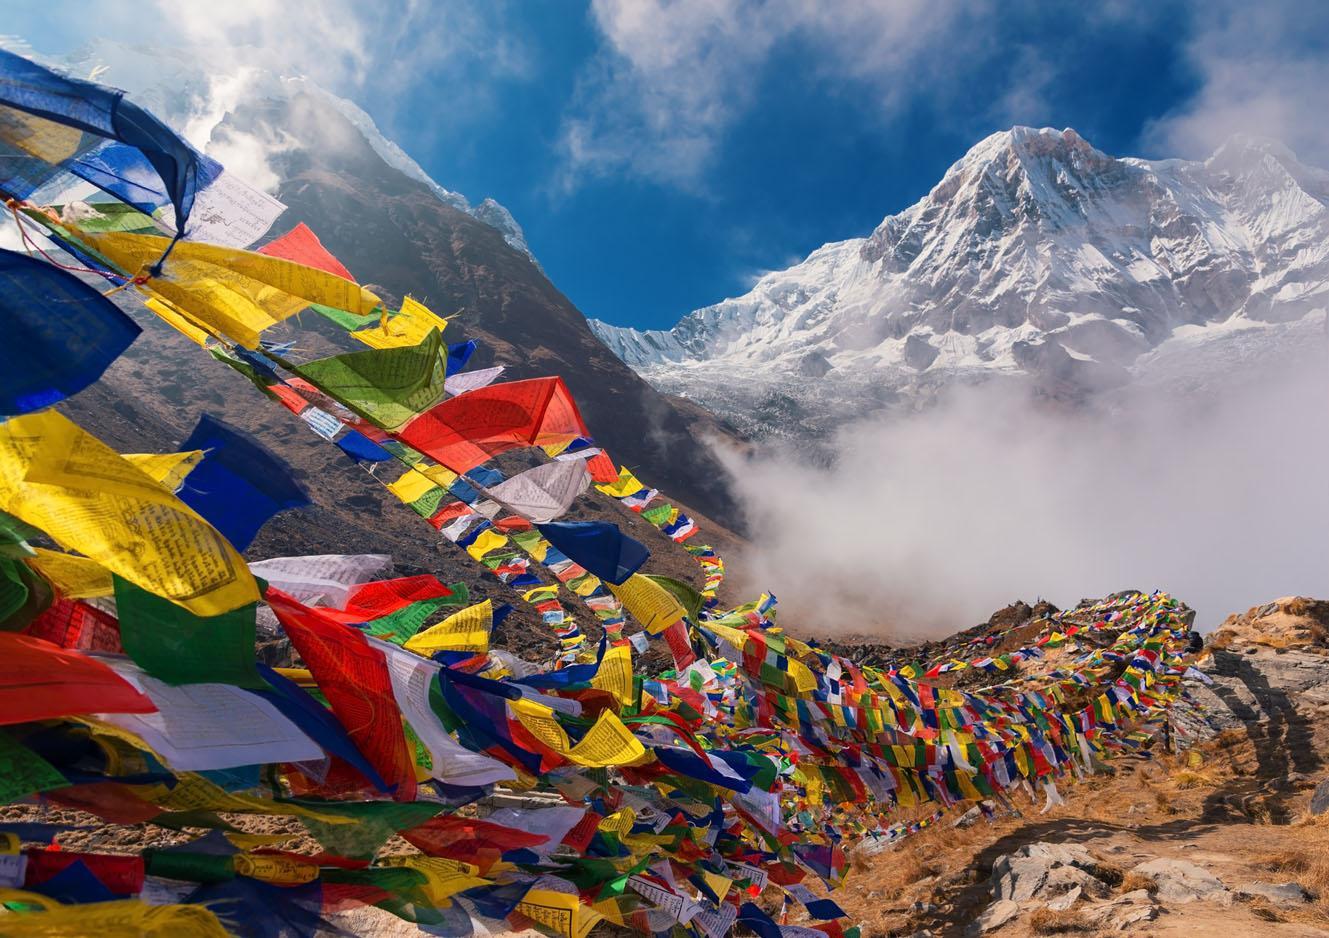 ТРЕККИНГ К АННАПУРНЕ (Непал)